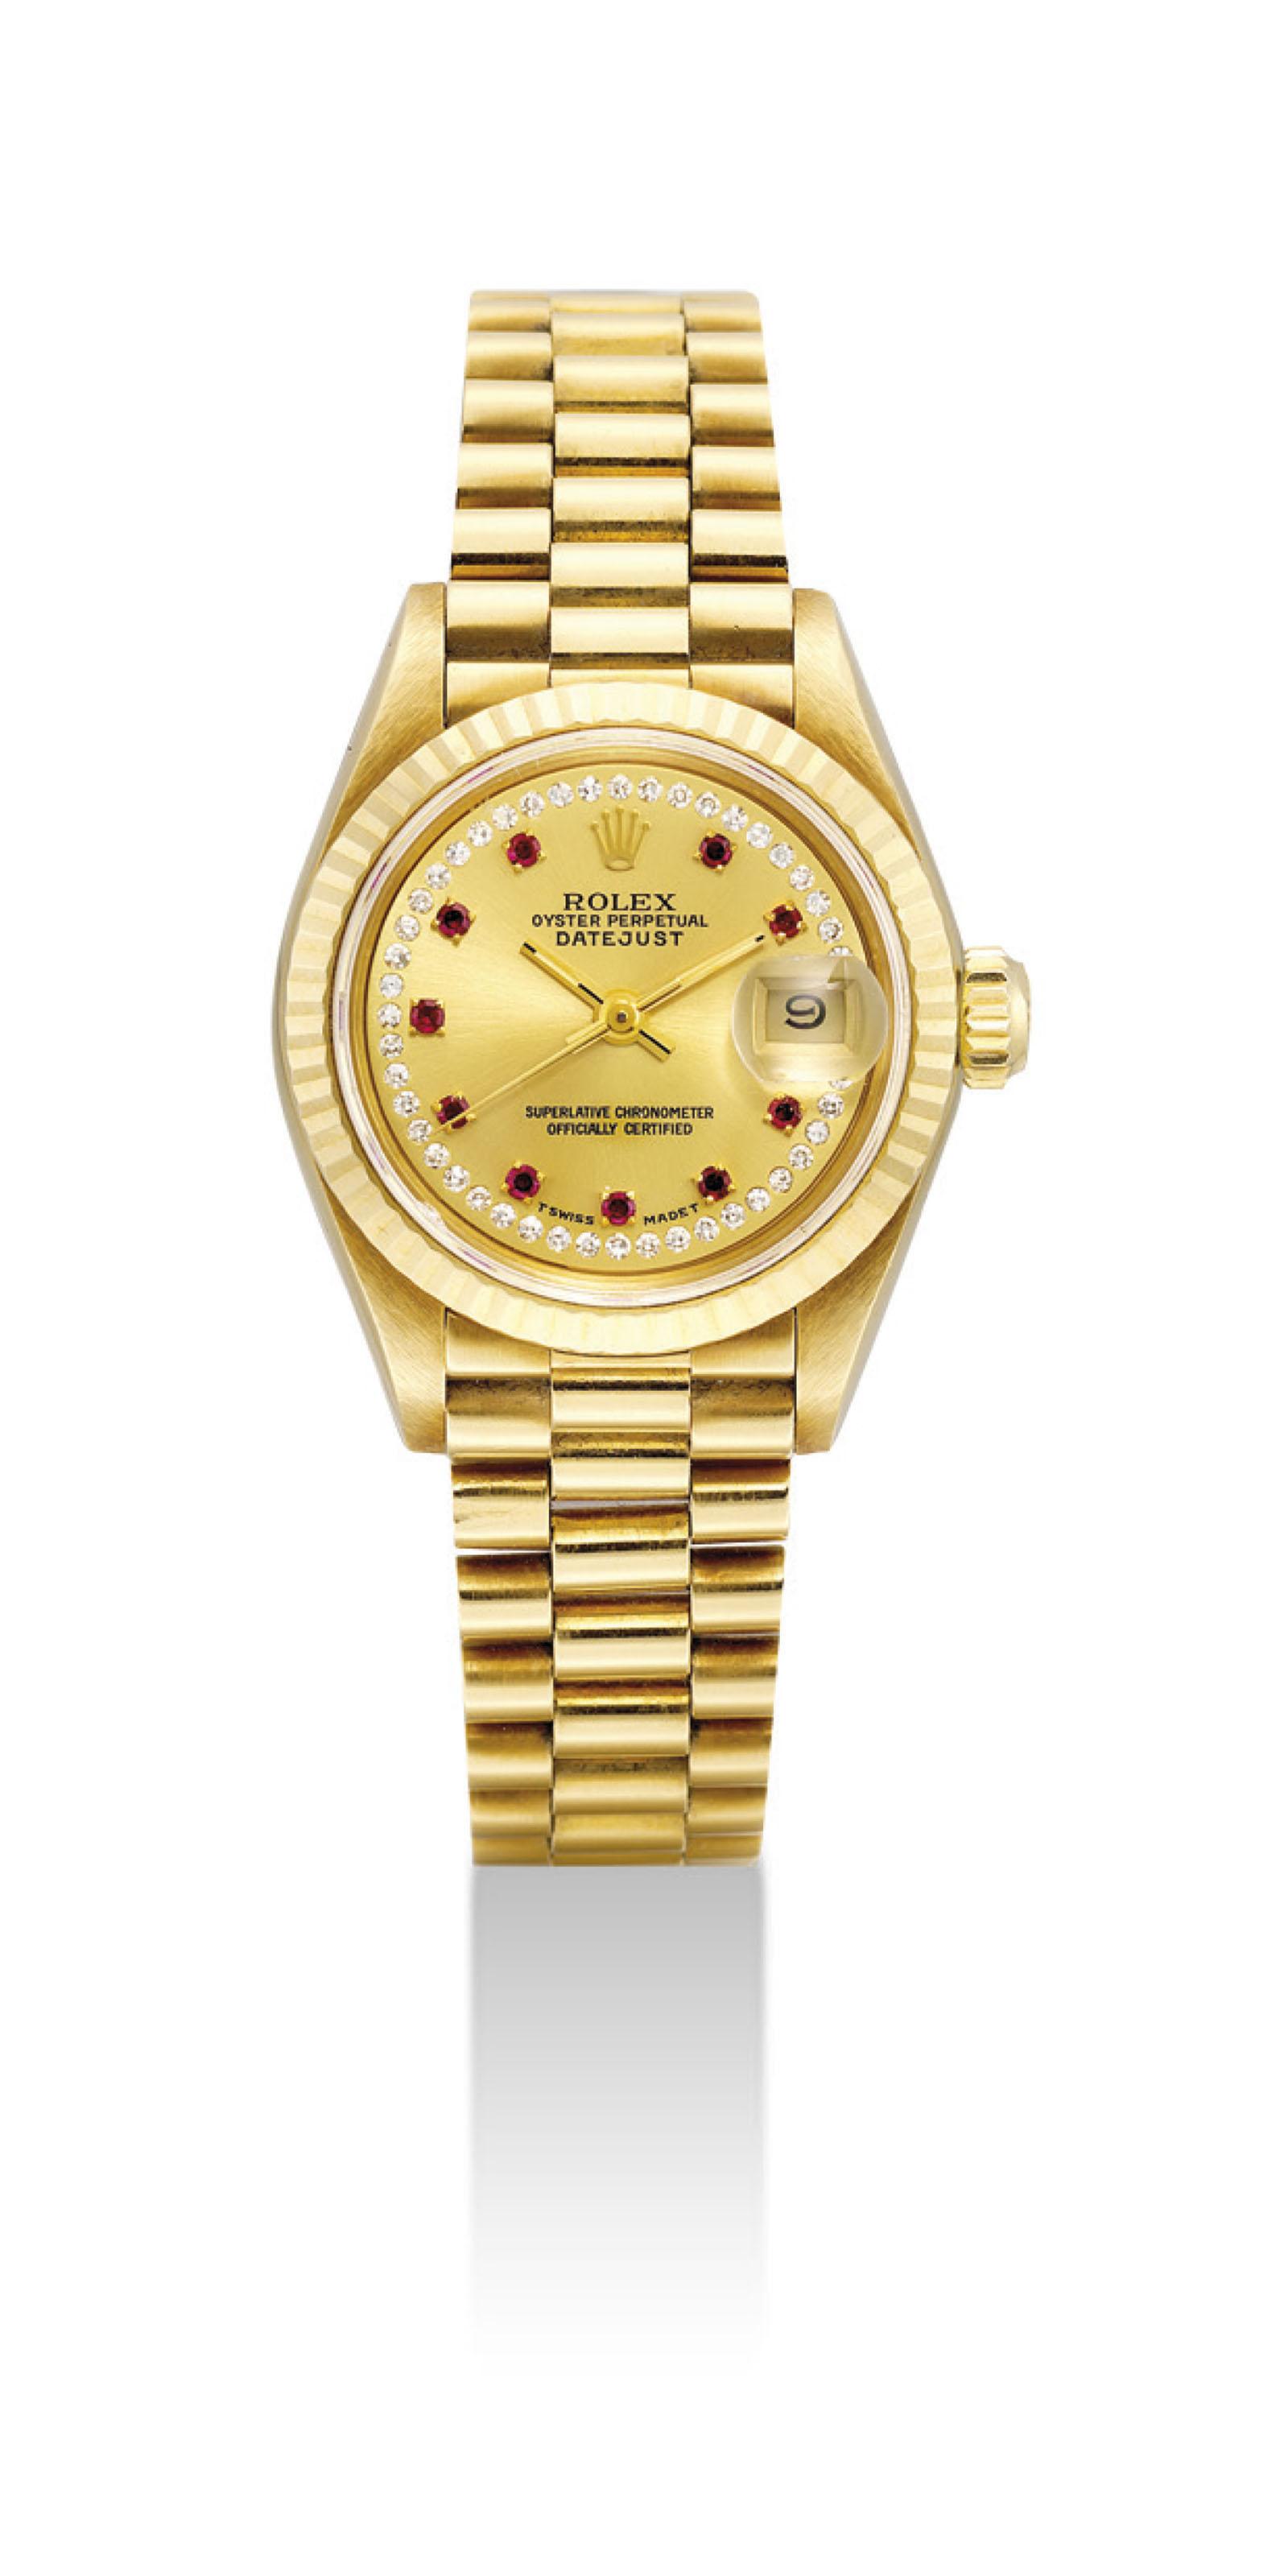 ROLEX. A LADY'S 18K GOLD, DIAM